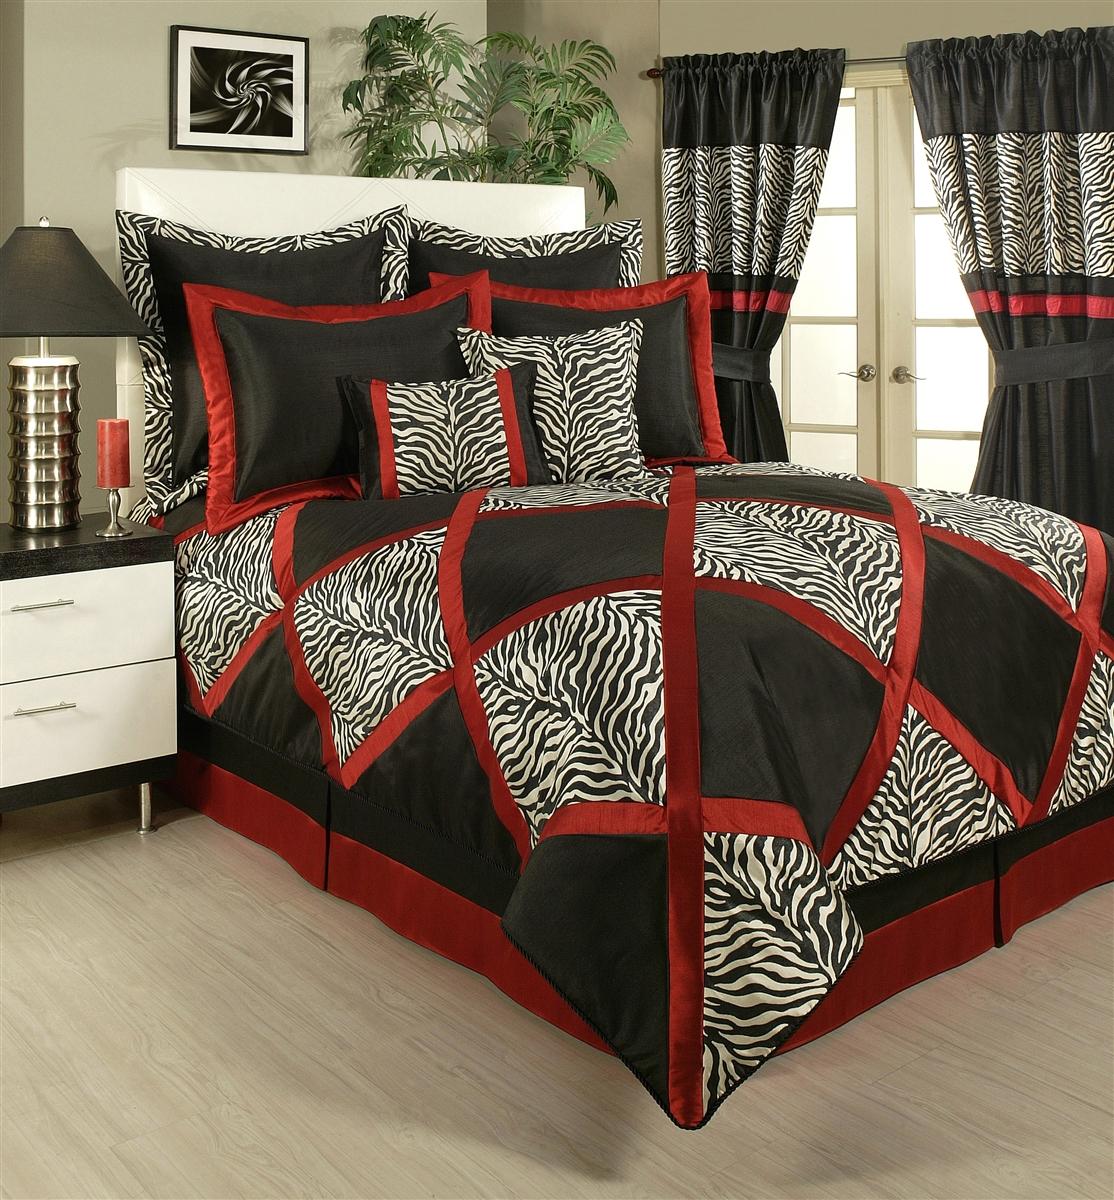 Sherry Kline True Safari Red White Black 4 Piece Comforter Set